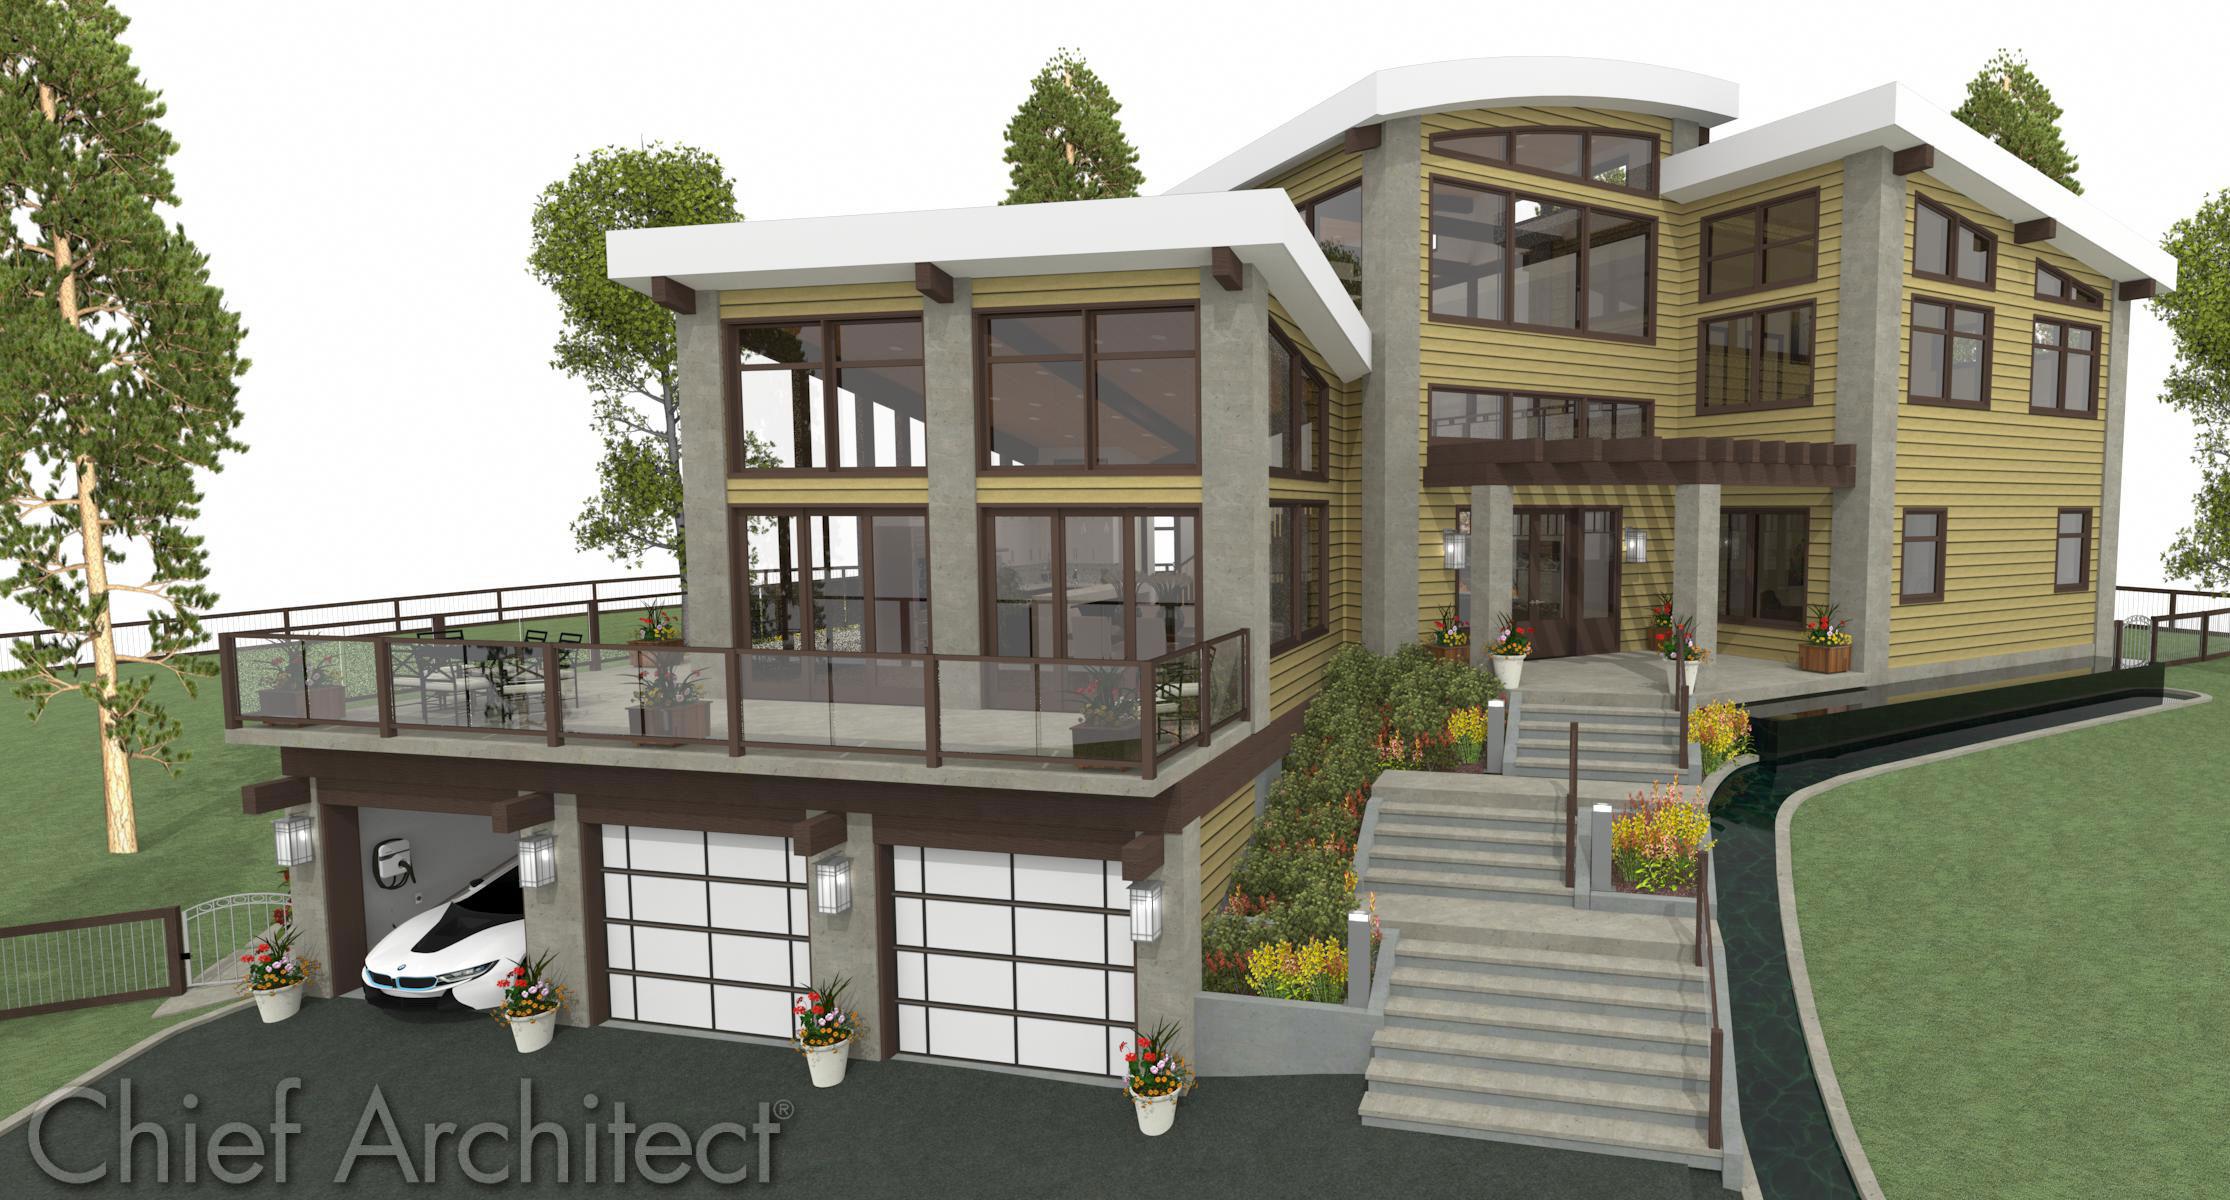 Home Design Software: Chief Architect Home Design Software